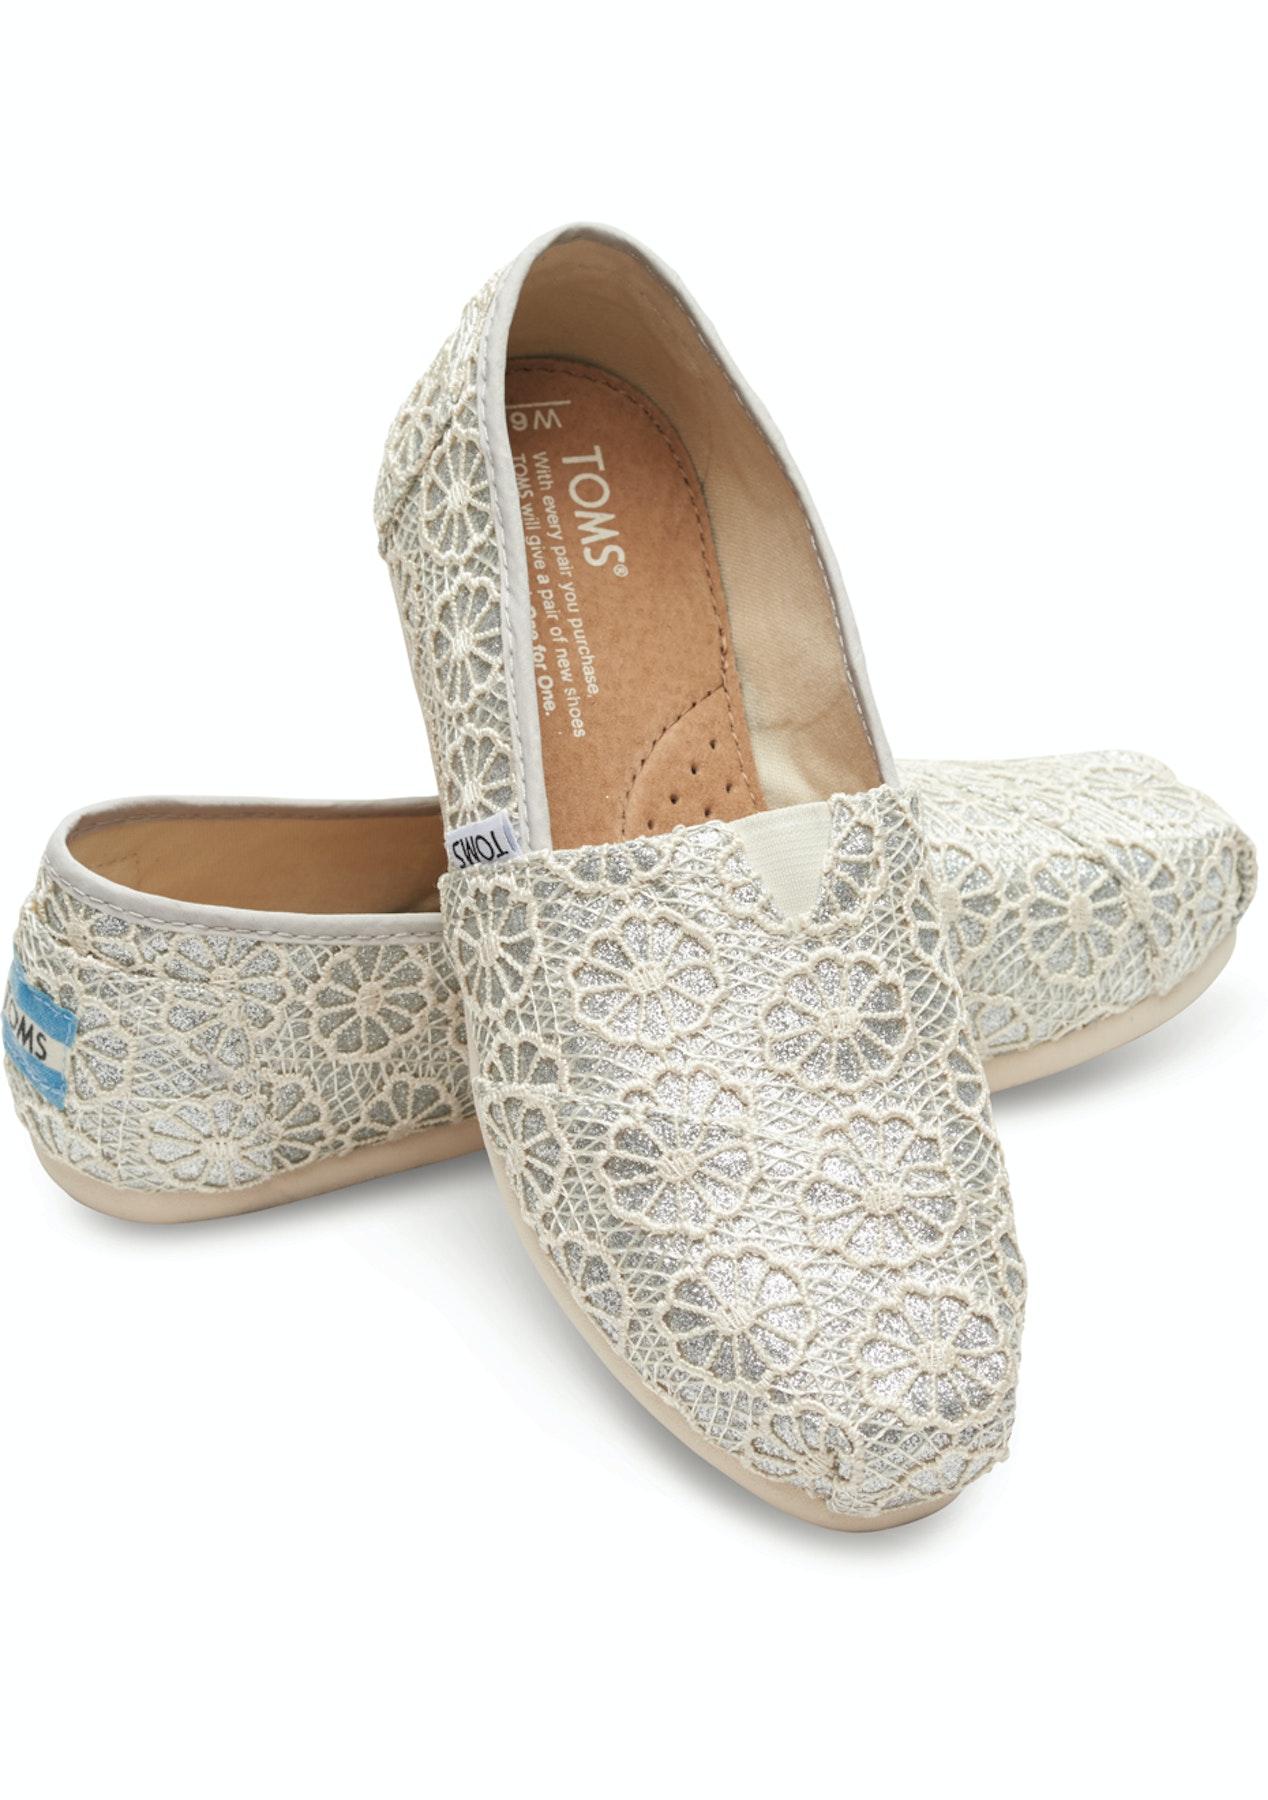 Toms Alpargata Silver Crochet Glitter Womens Shoes Onceit